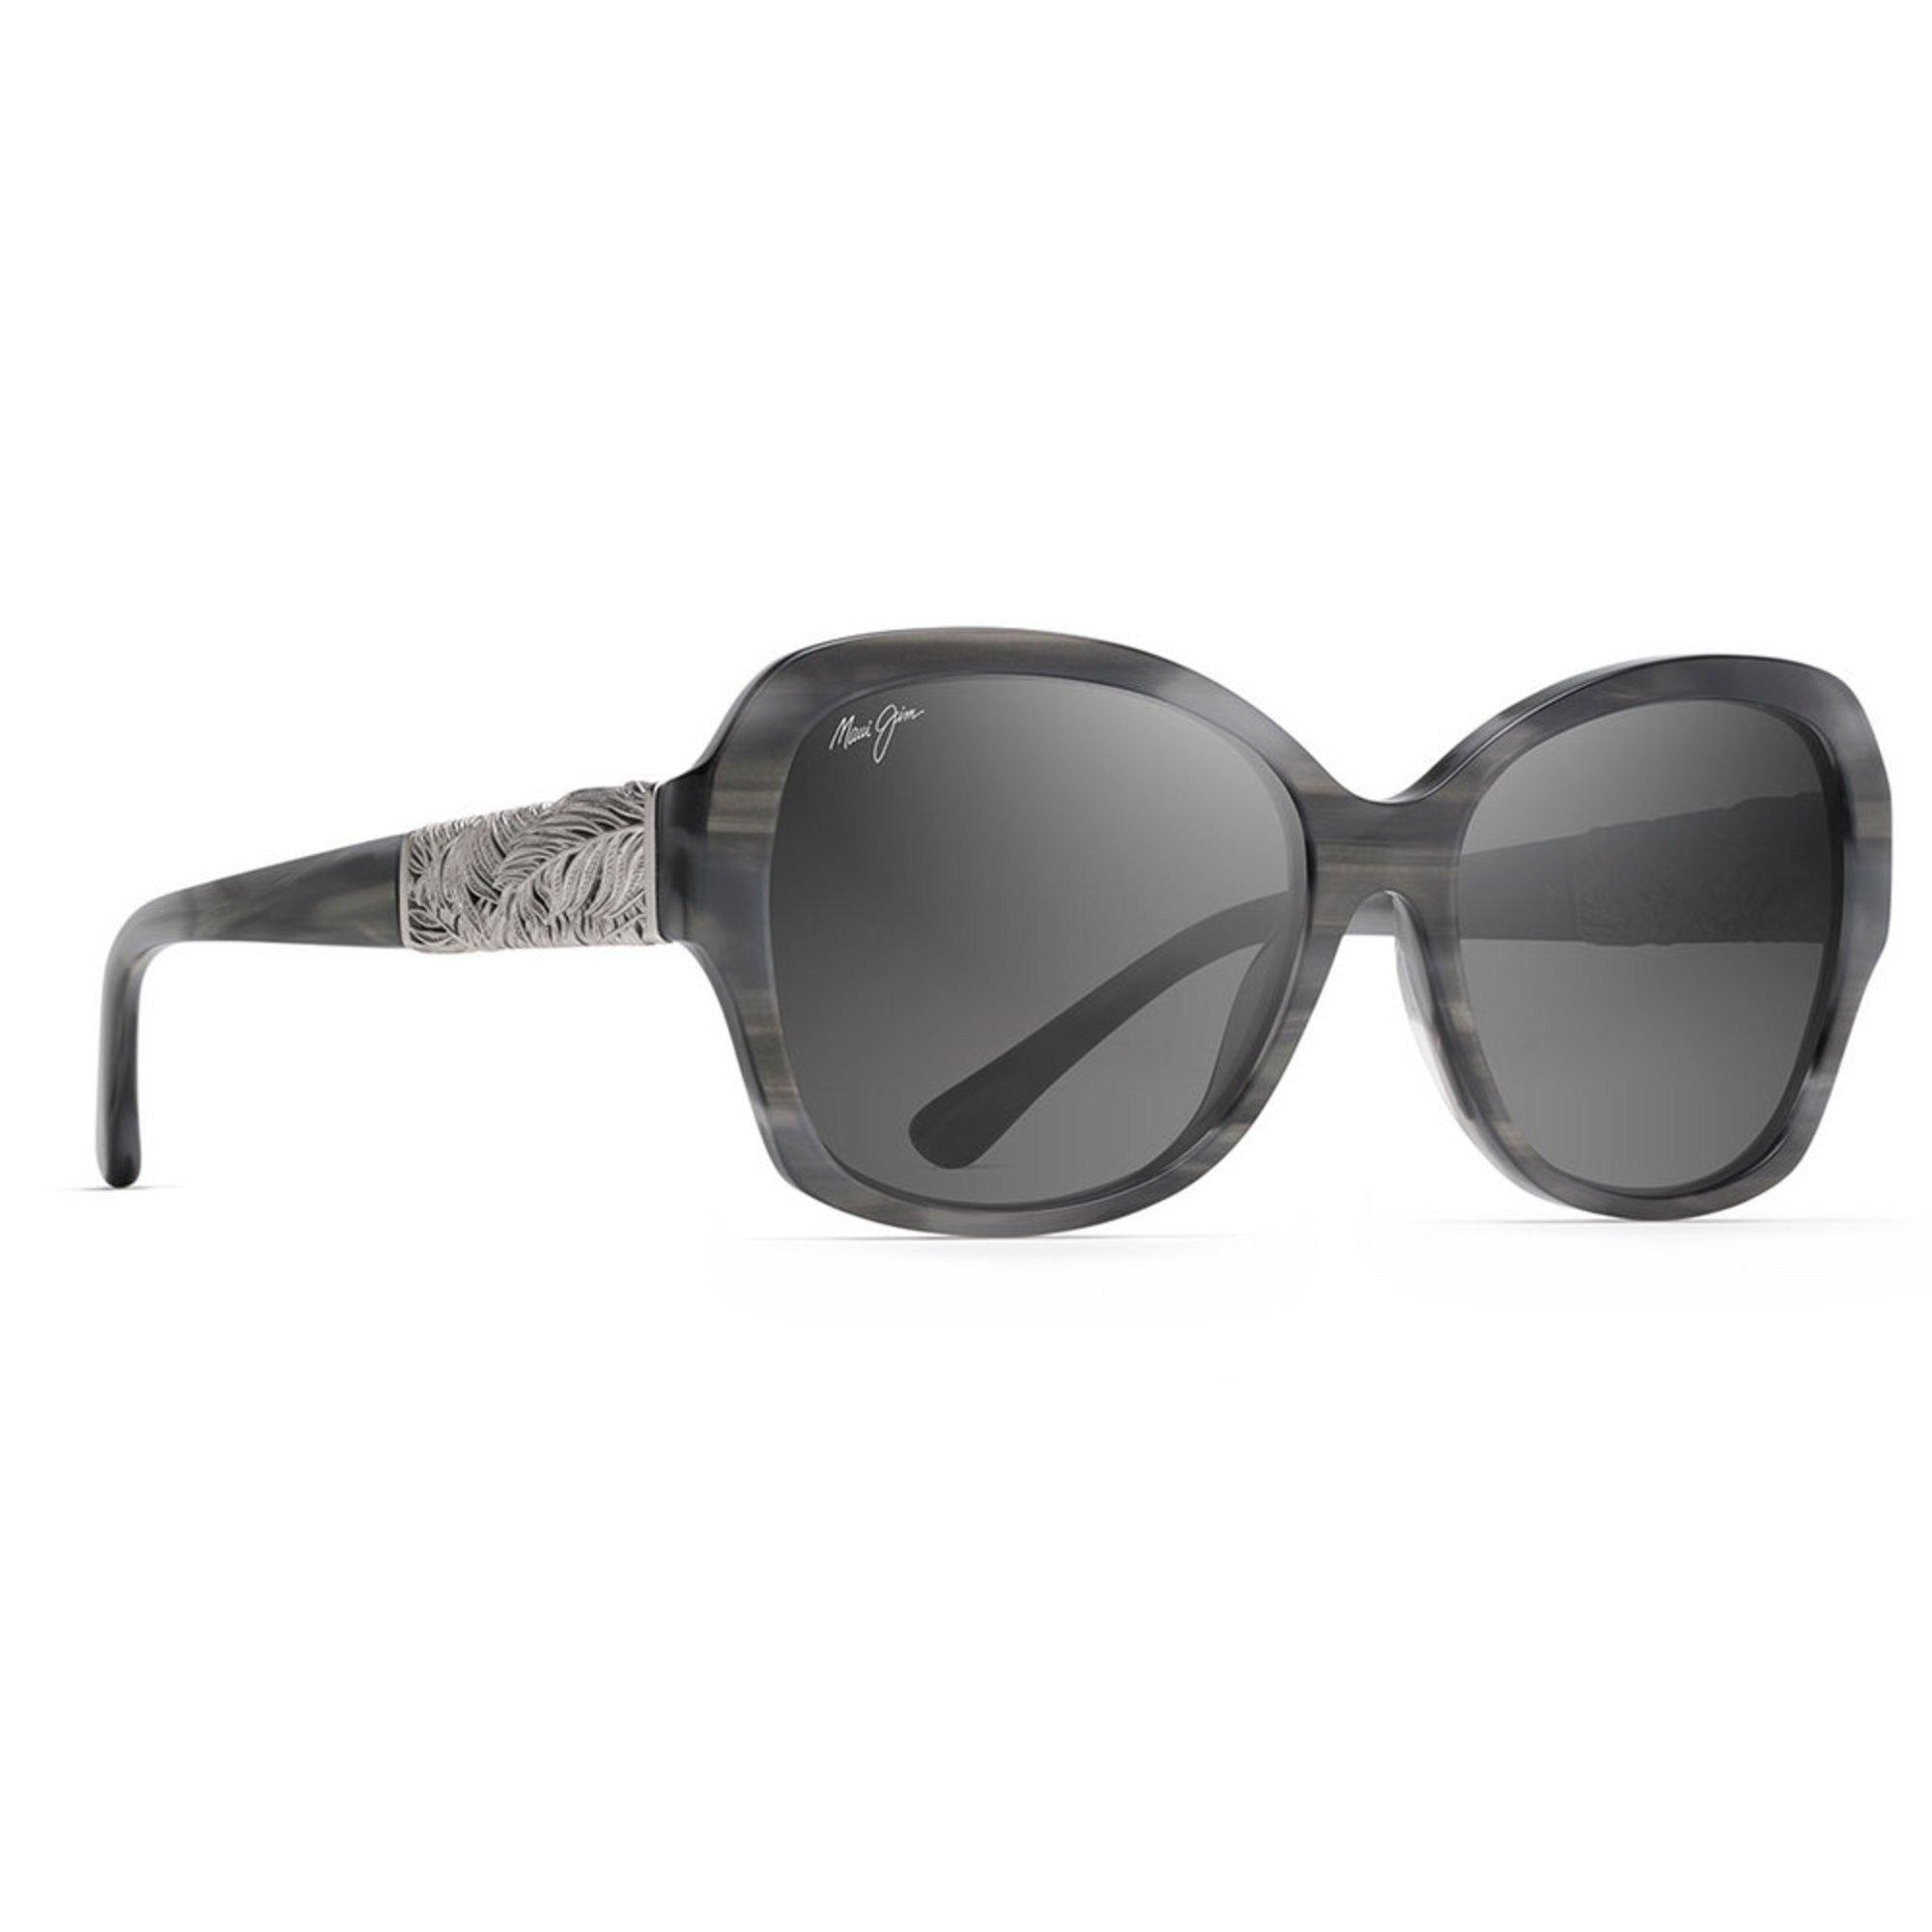 dab2ee6d75d38 Maui Jim. Maui Jim Womens Swaying Palms Blue Grey Gold Sunglasses 57mm